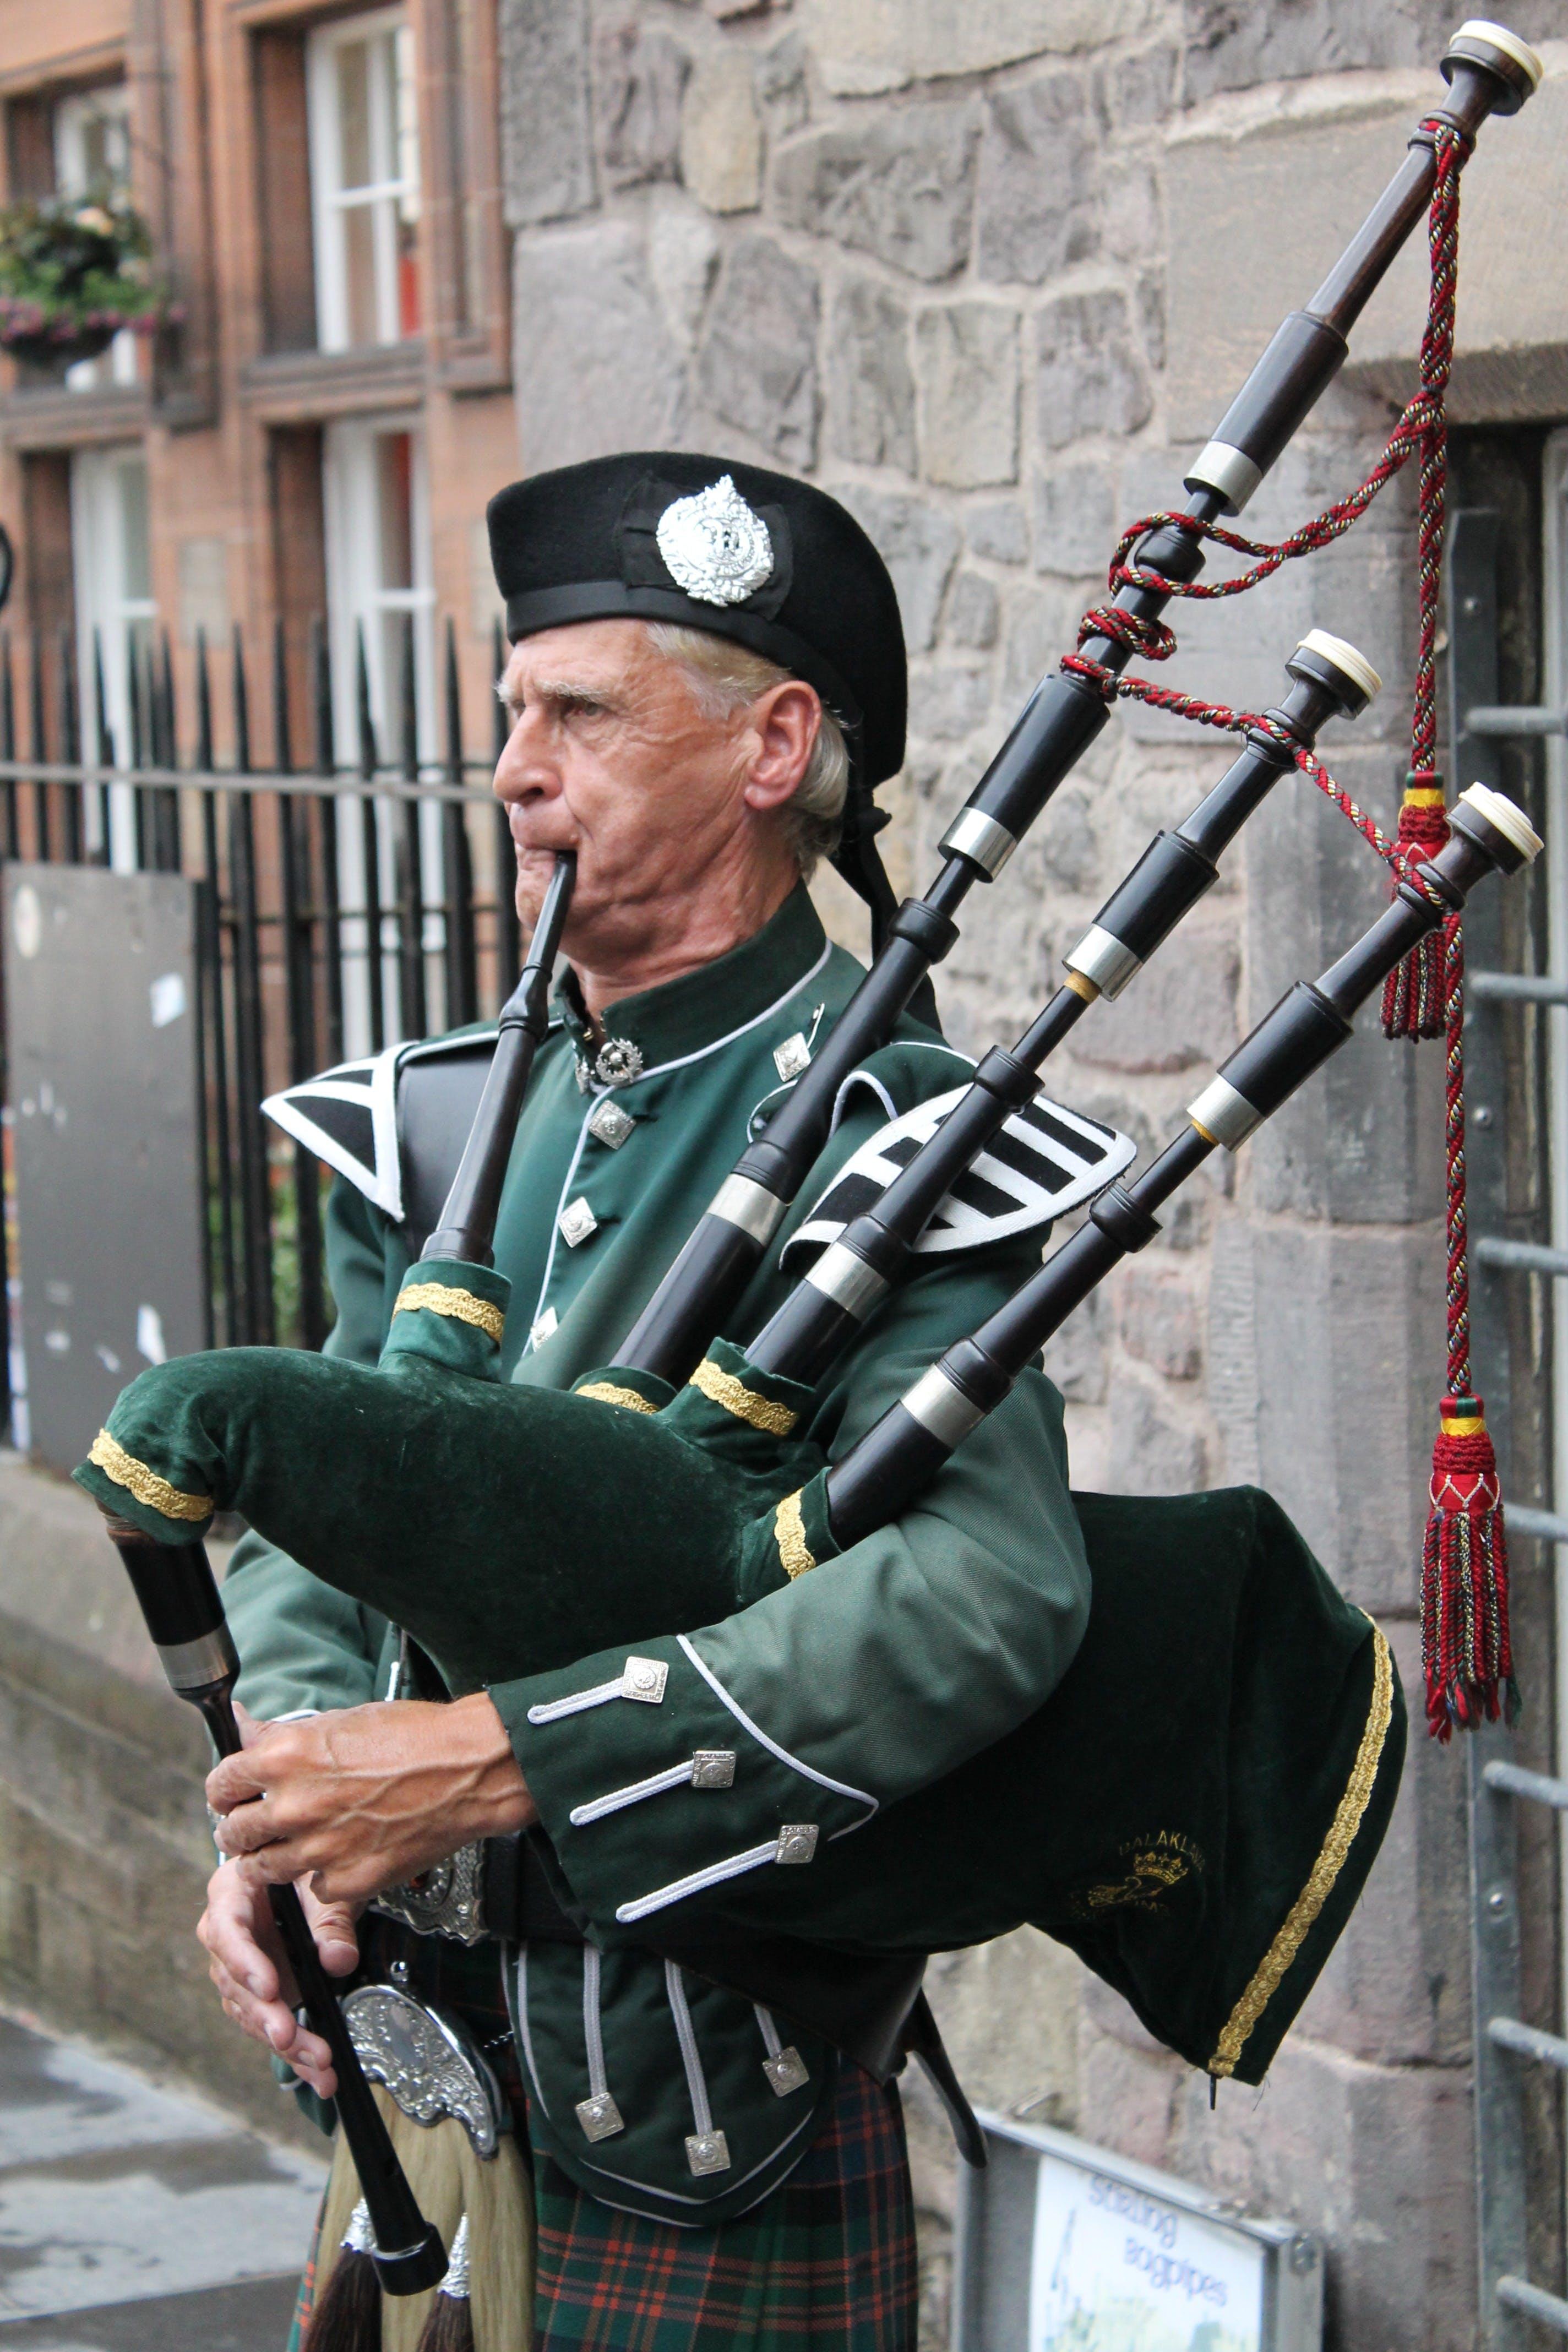 bagpiper, bagpipes, elderly man